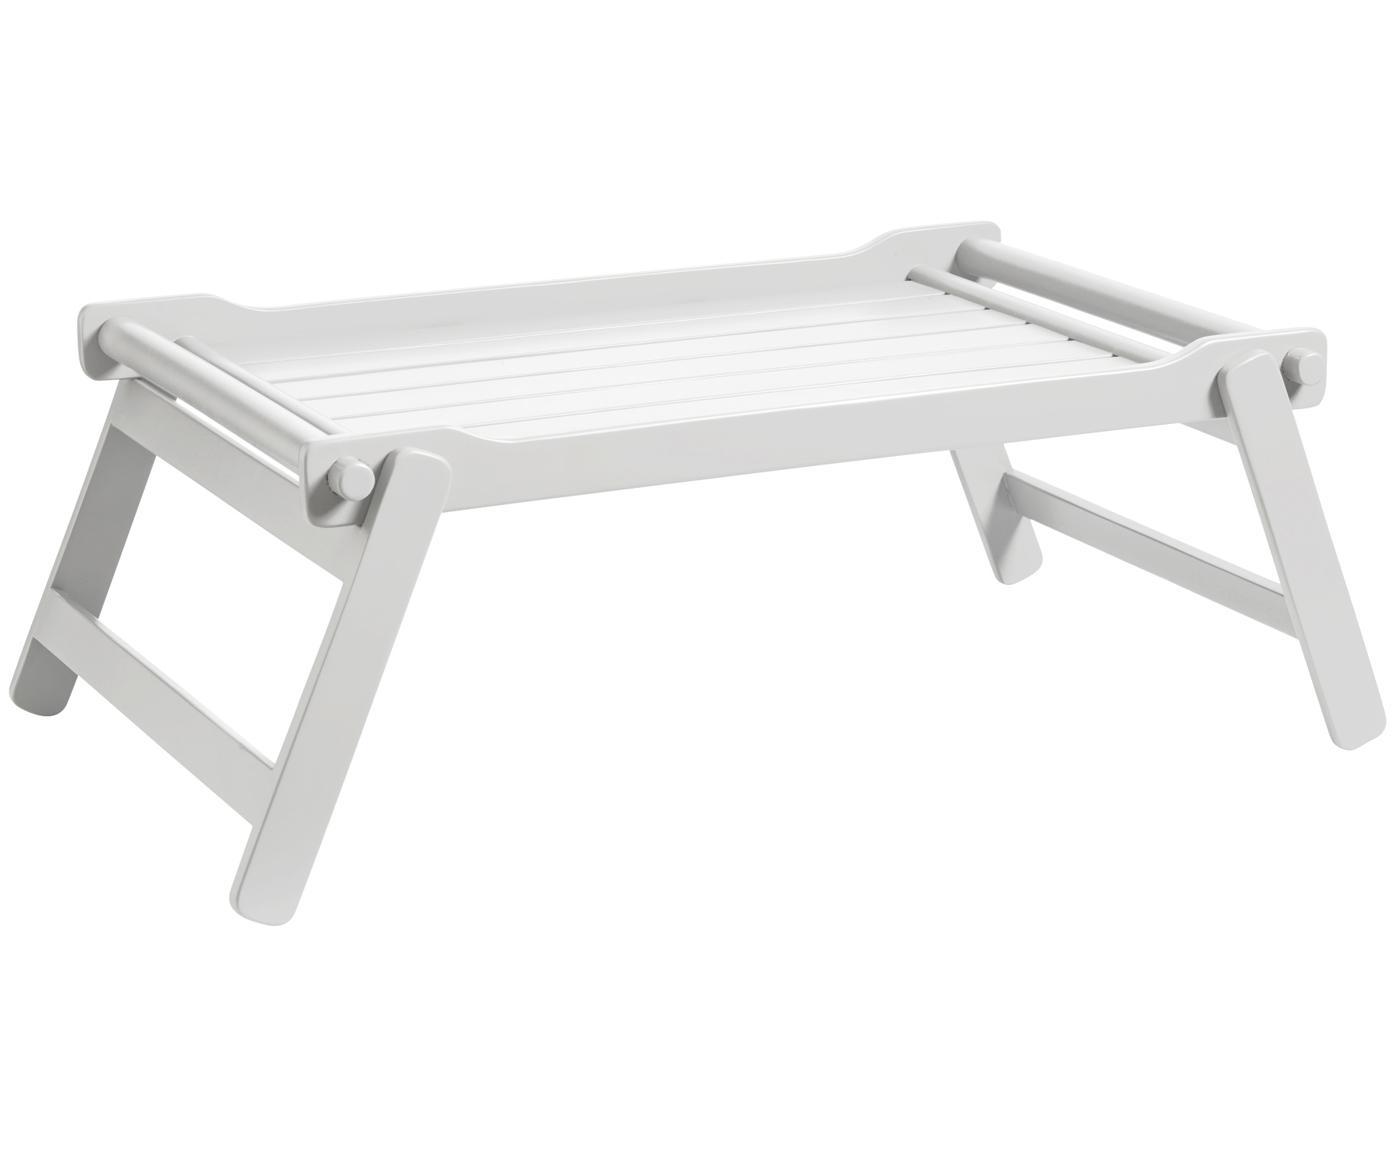 Bandeja de madera Bed, plegable, Madera de caoba, poliuretano pintado, Blanco, An 58 x F 36 cm